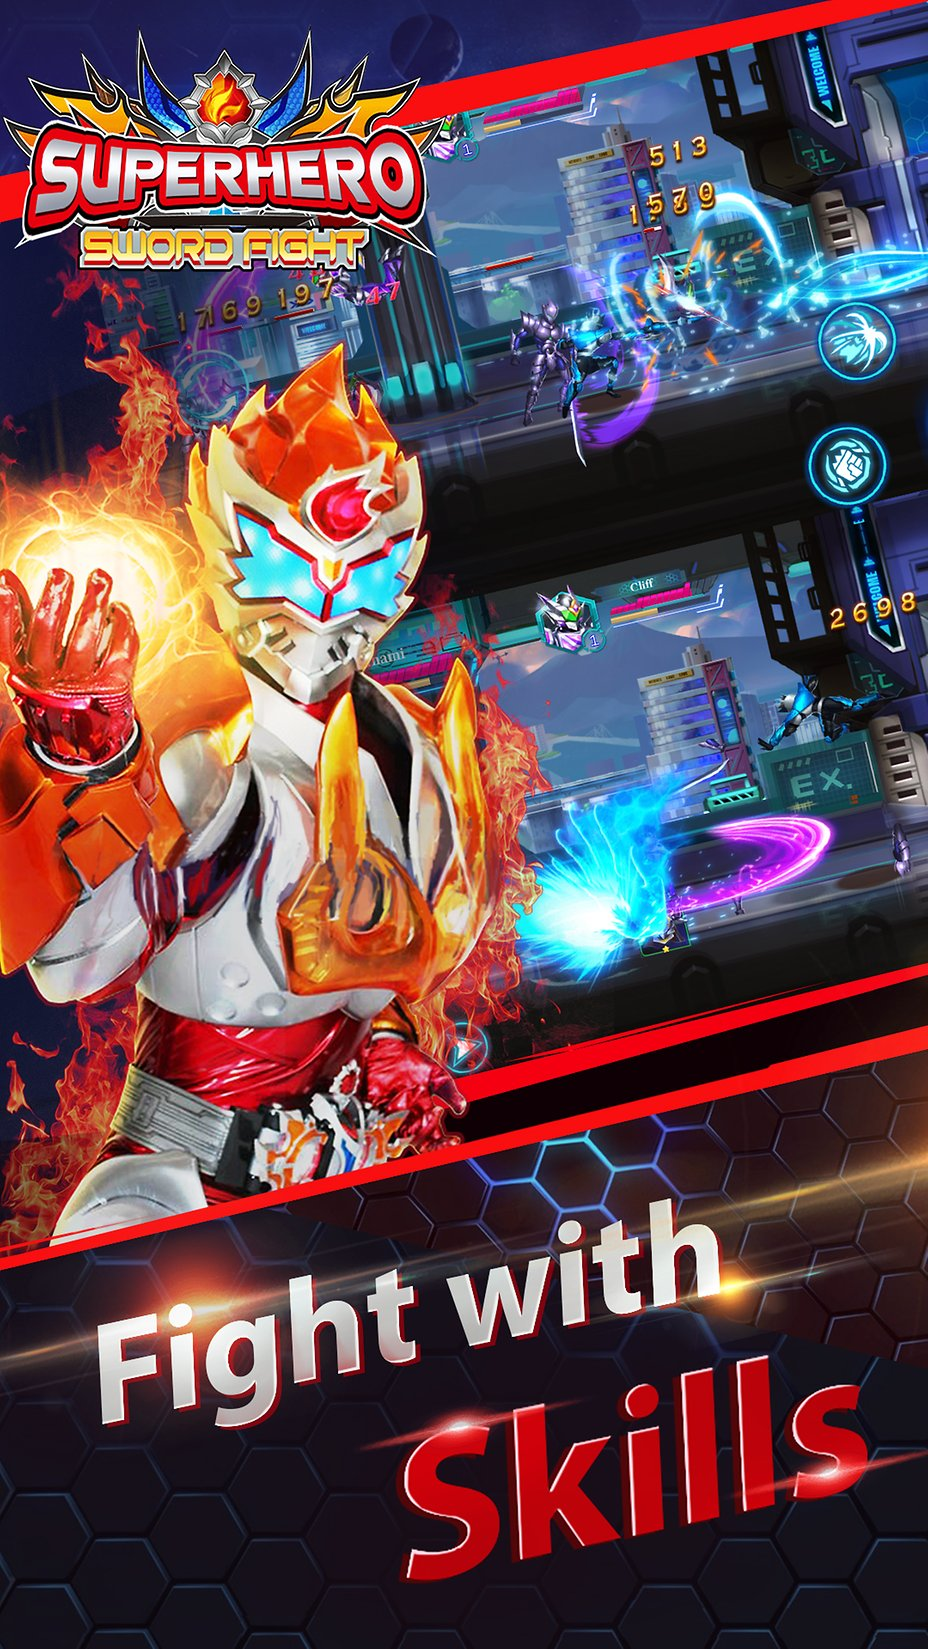 superhero fight sword battle action rpg unimob games